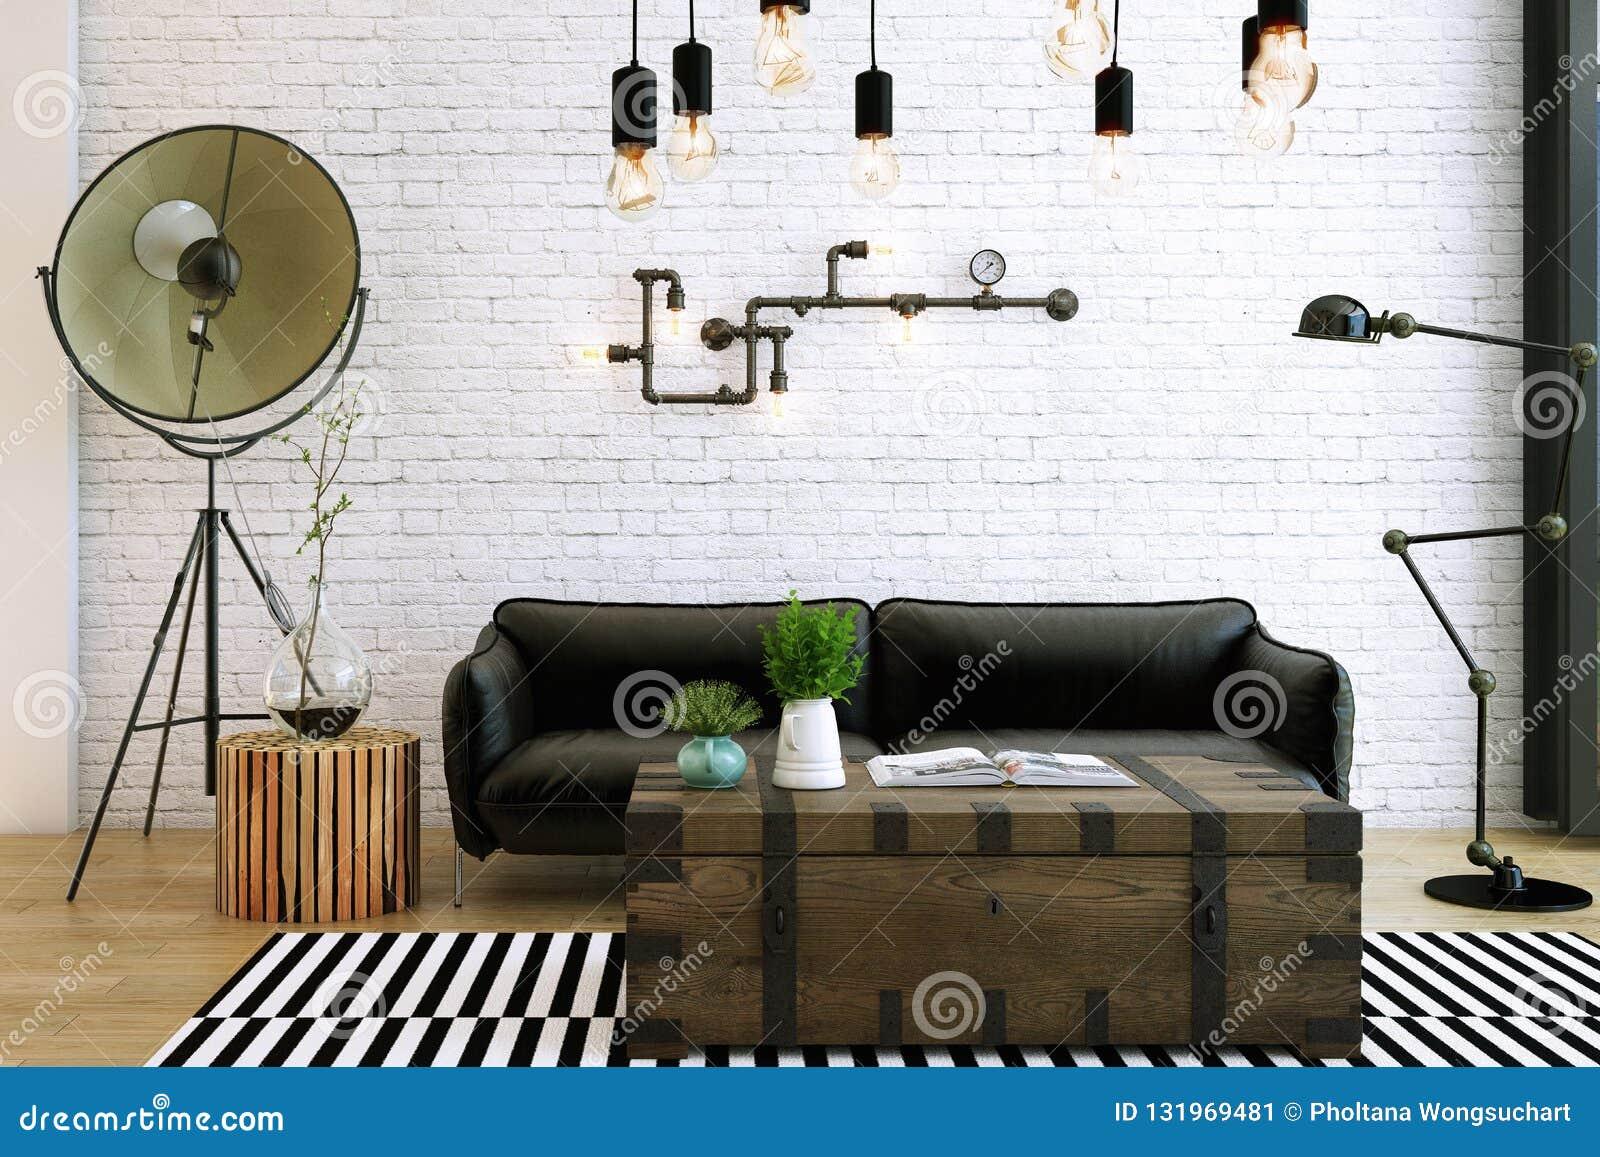 Livingroom design ,interior of industrial style